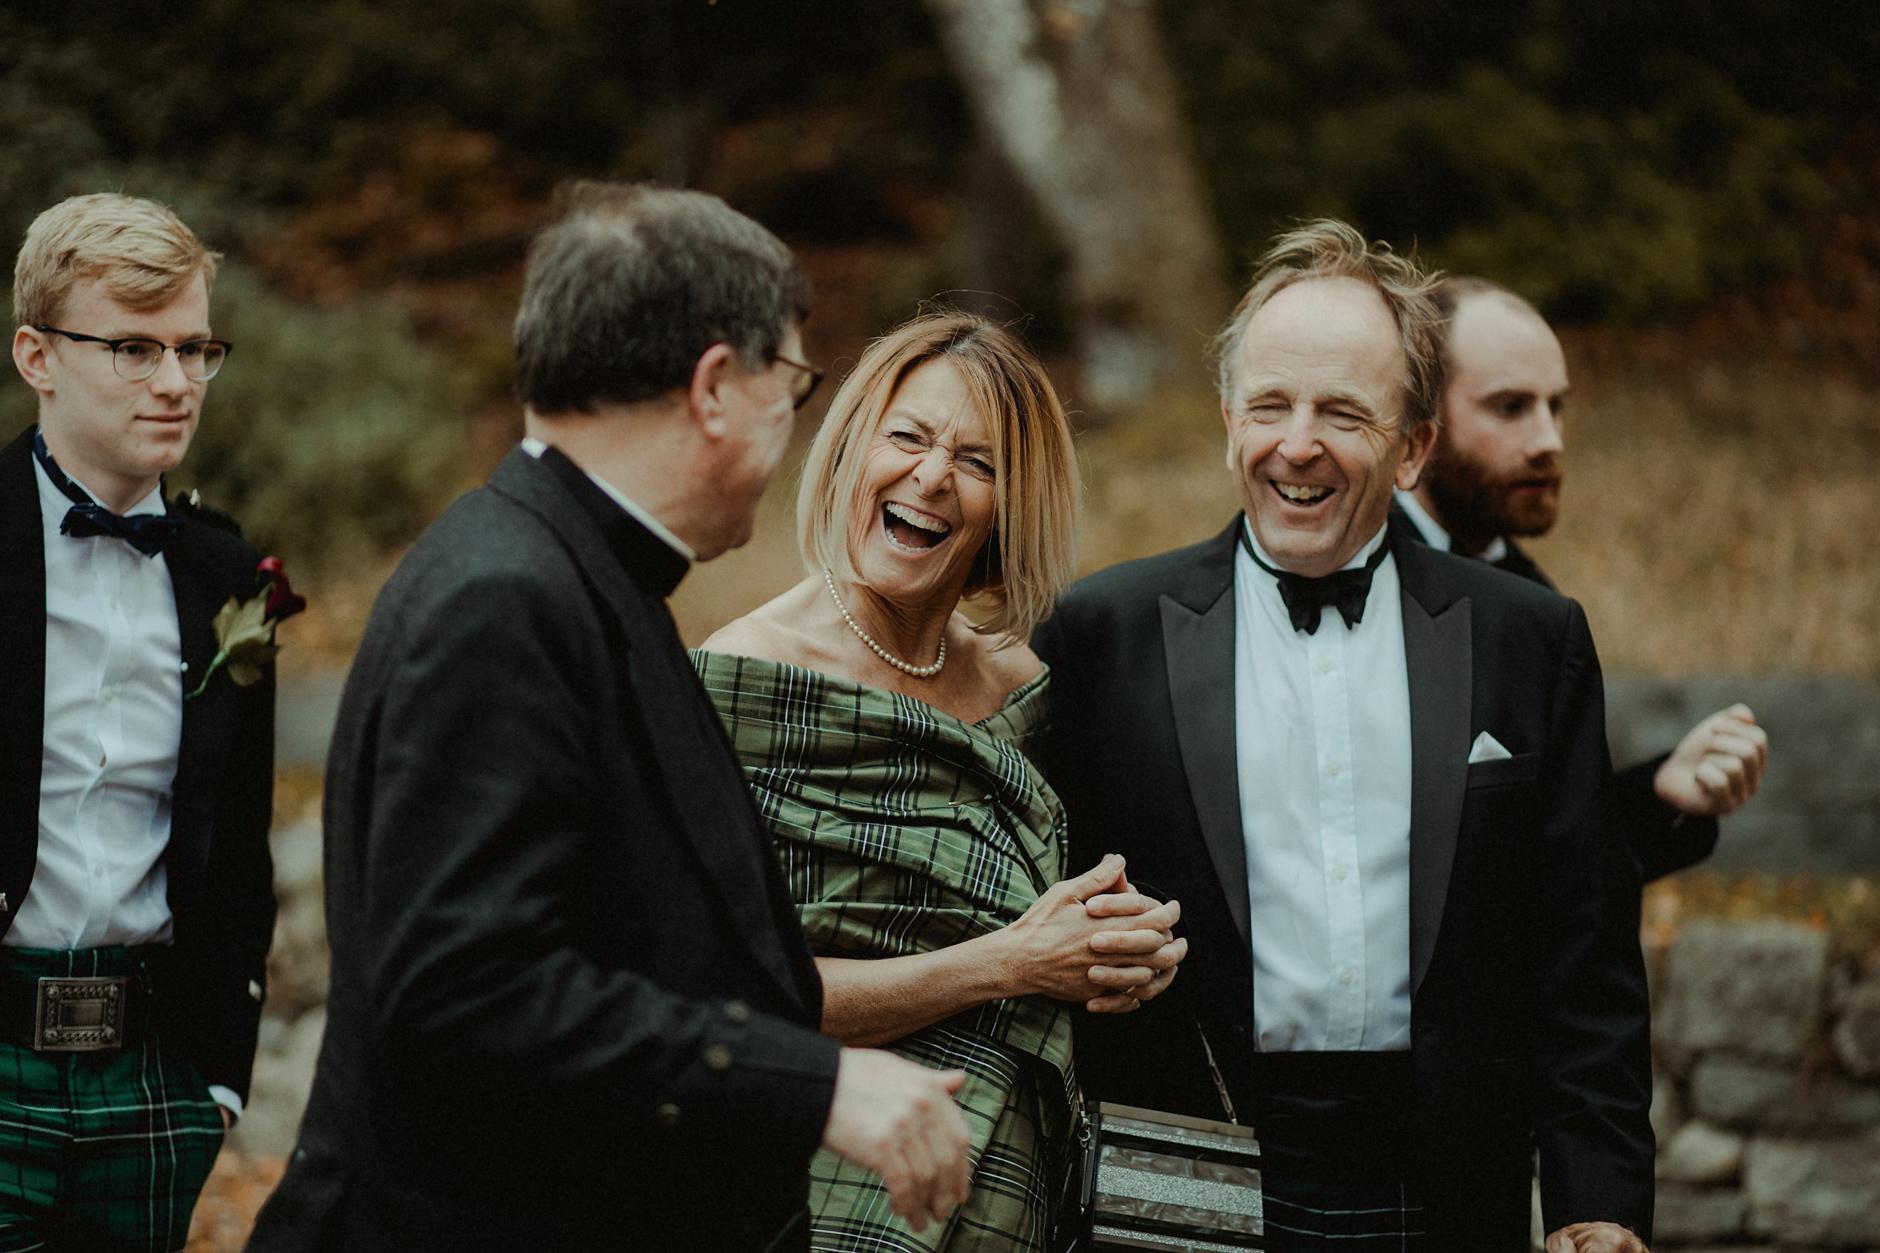 Glentruim-Wedding-Nikki-Leadbetter-Photography-65.jpg